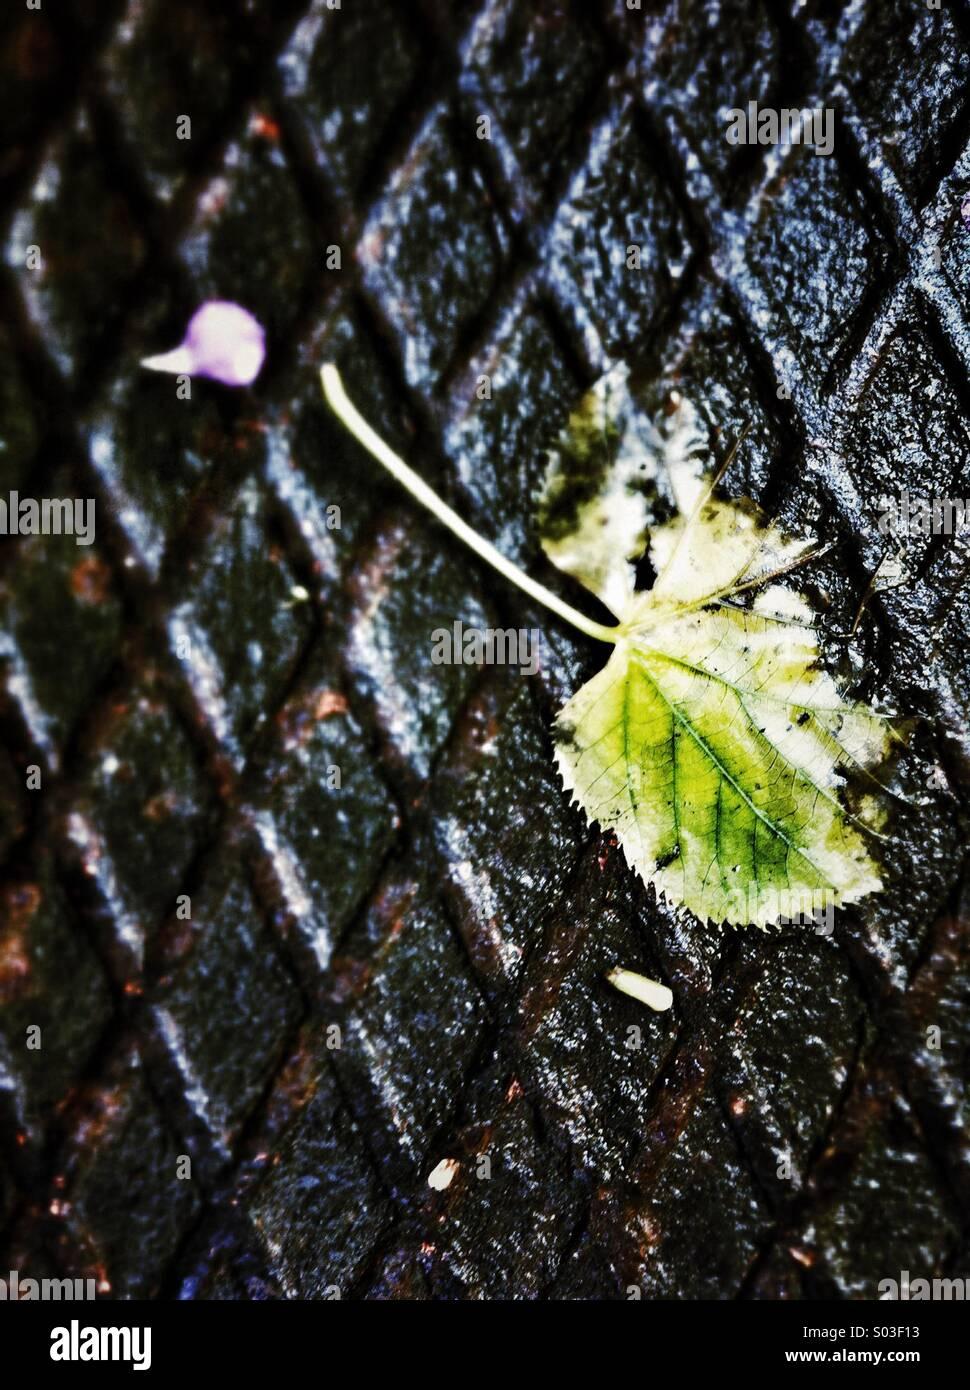 fallen leaf - Stock Image